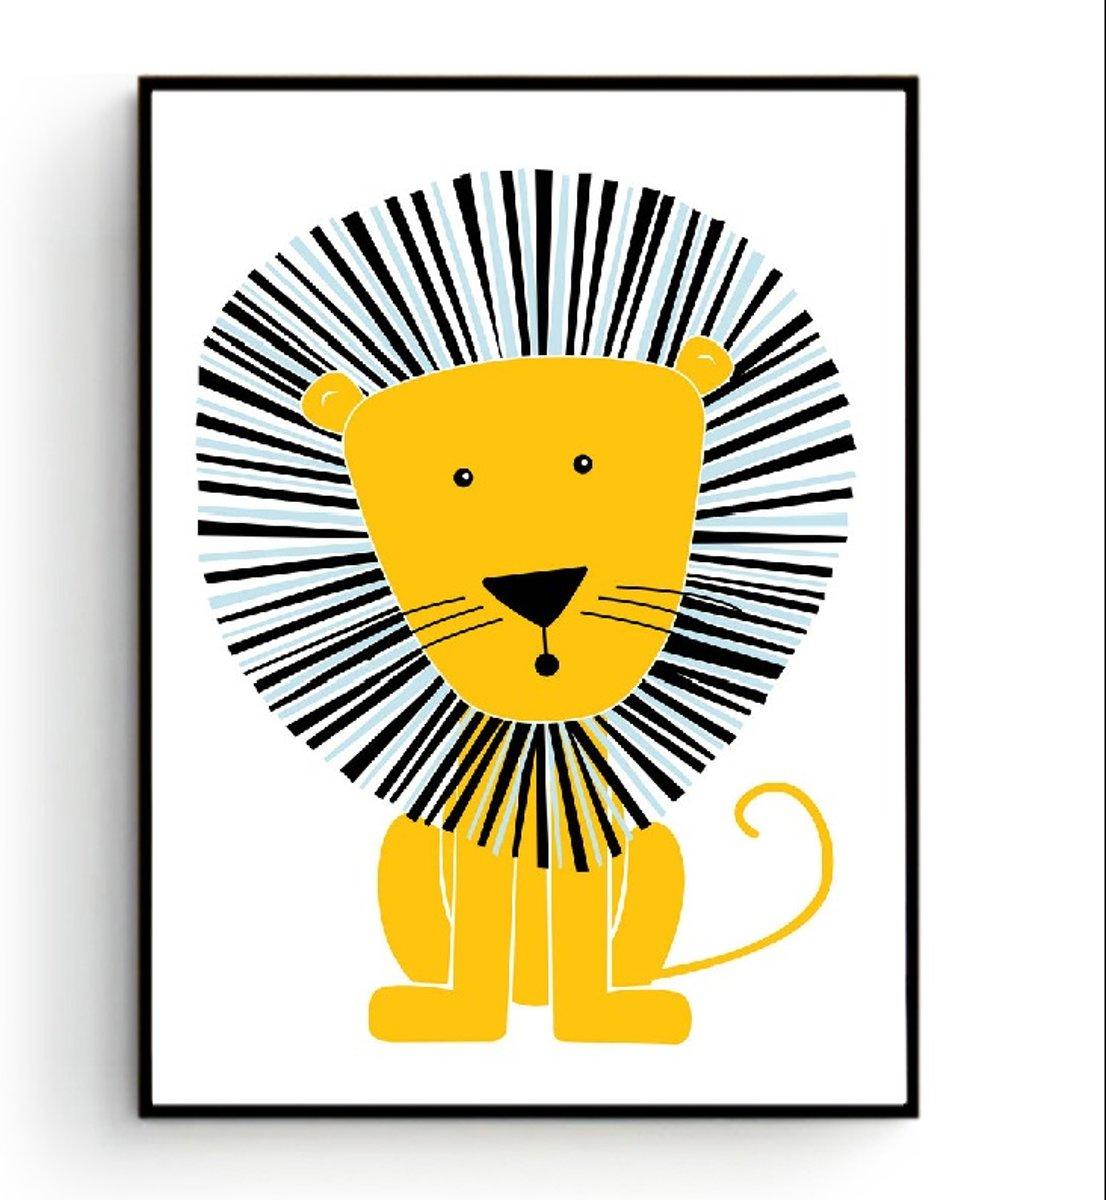 Postercity - Design Canvas Poster Stoere Leeuw / Kinderkamer / Muurdecoratie / 40 x 30cm / A3